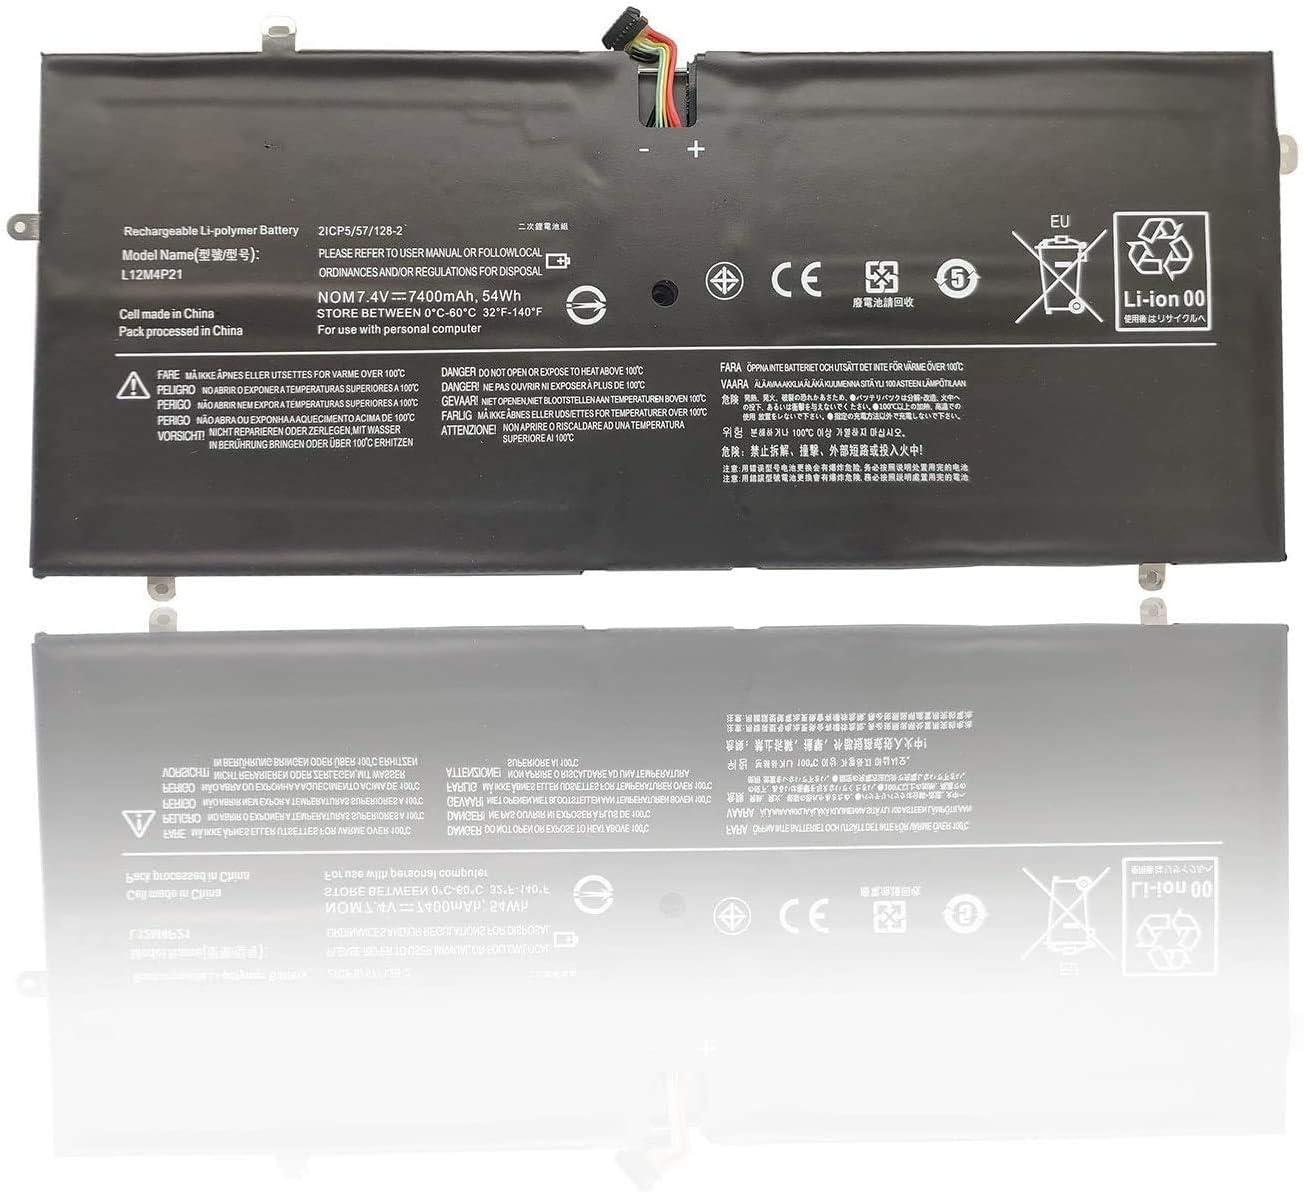 Batterymarket L12M4P21 Replacement Ranking TOP19 Laptop Compatible wit Battery Popularity